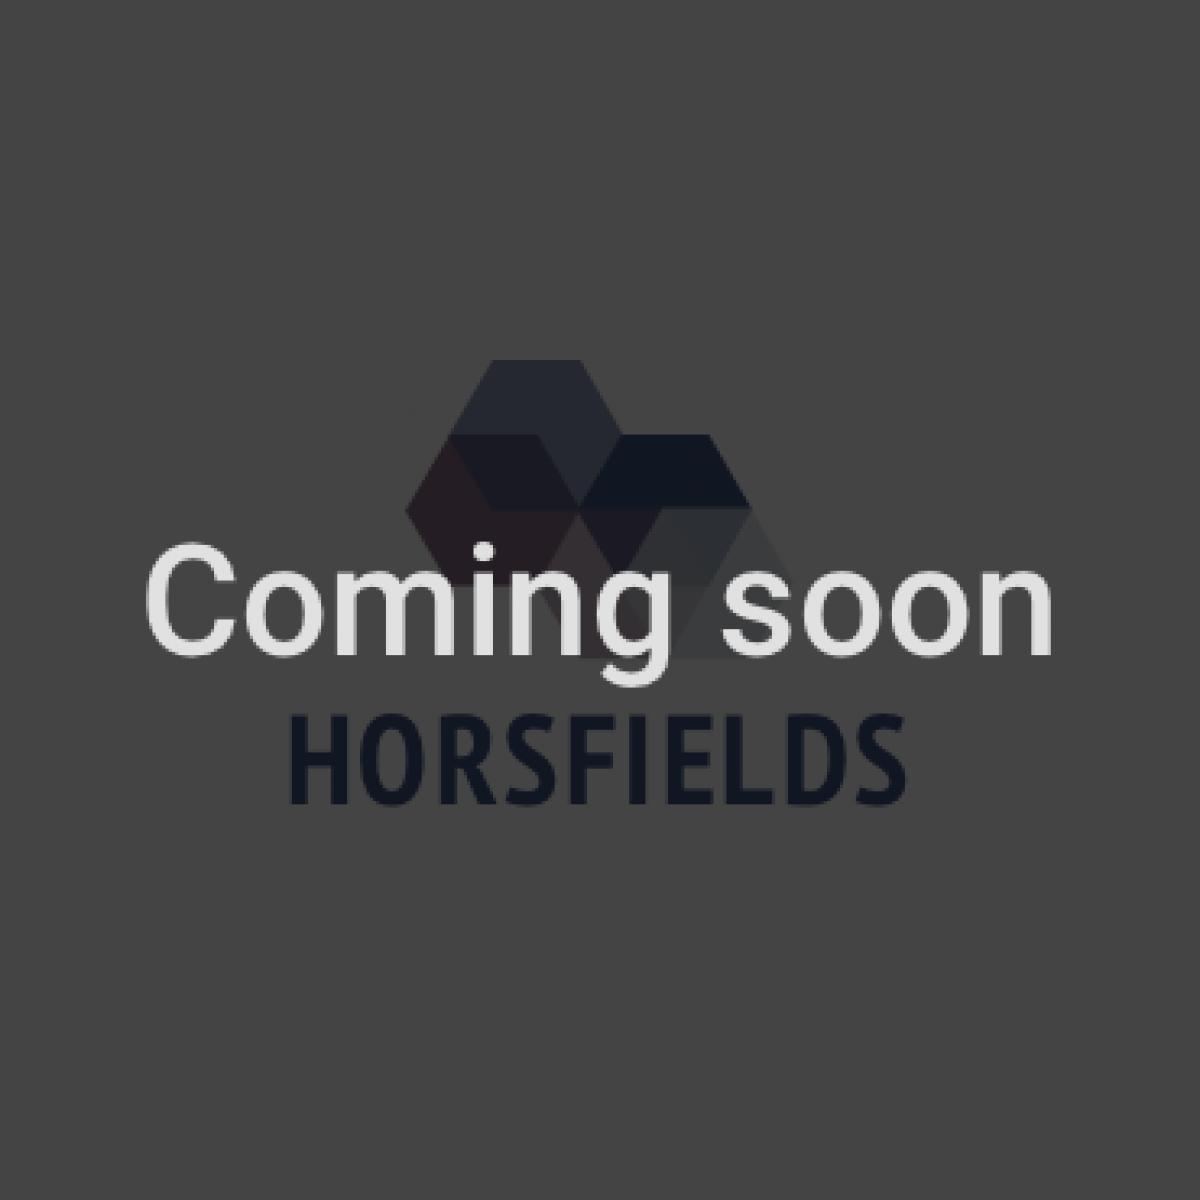 horsfields-soon